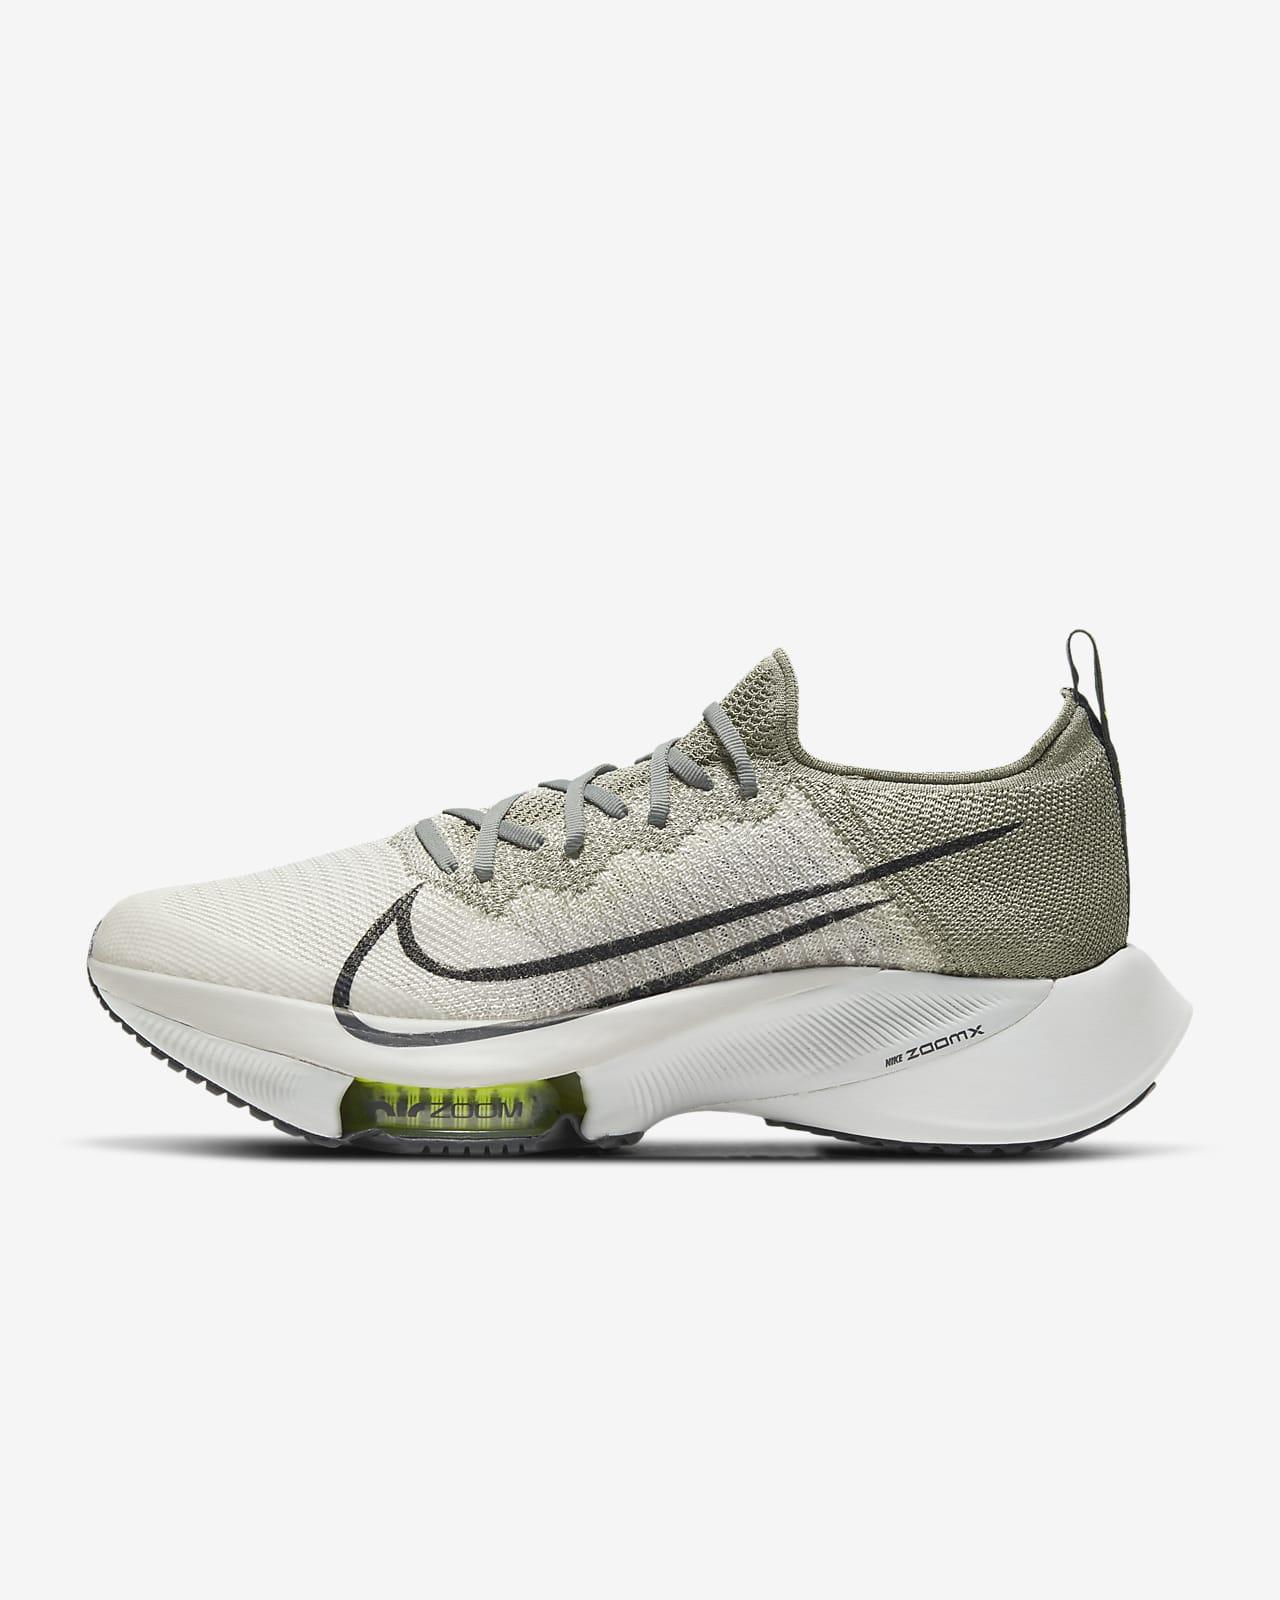 Nike Air Zoom Tempo NEXT% Erkek Koşu Ayakkabısı